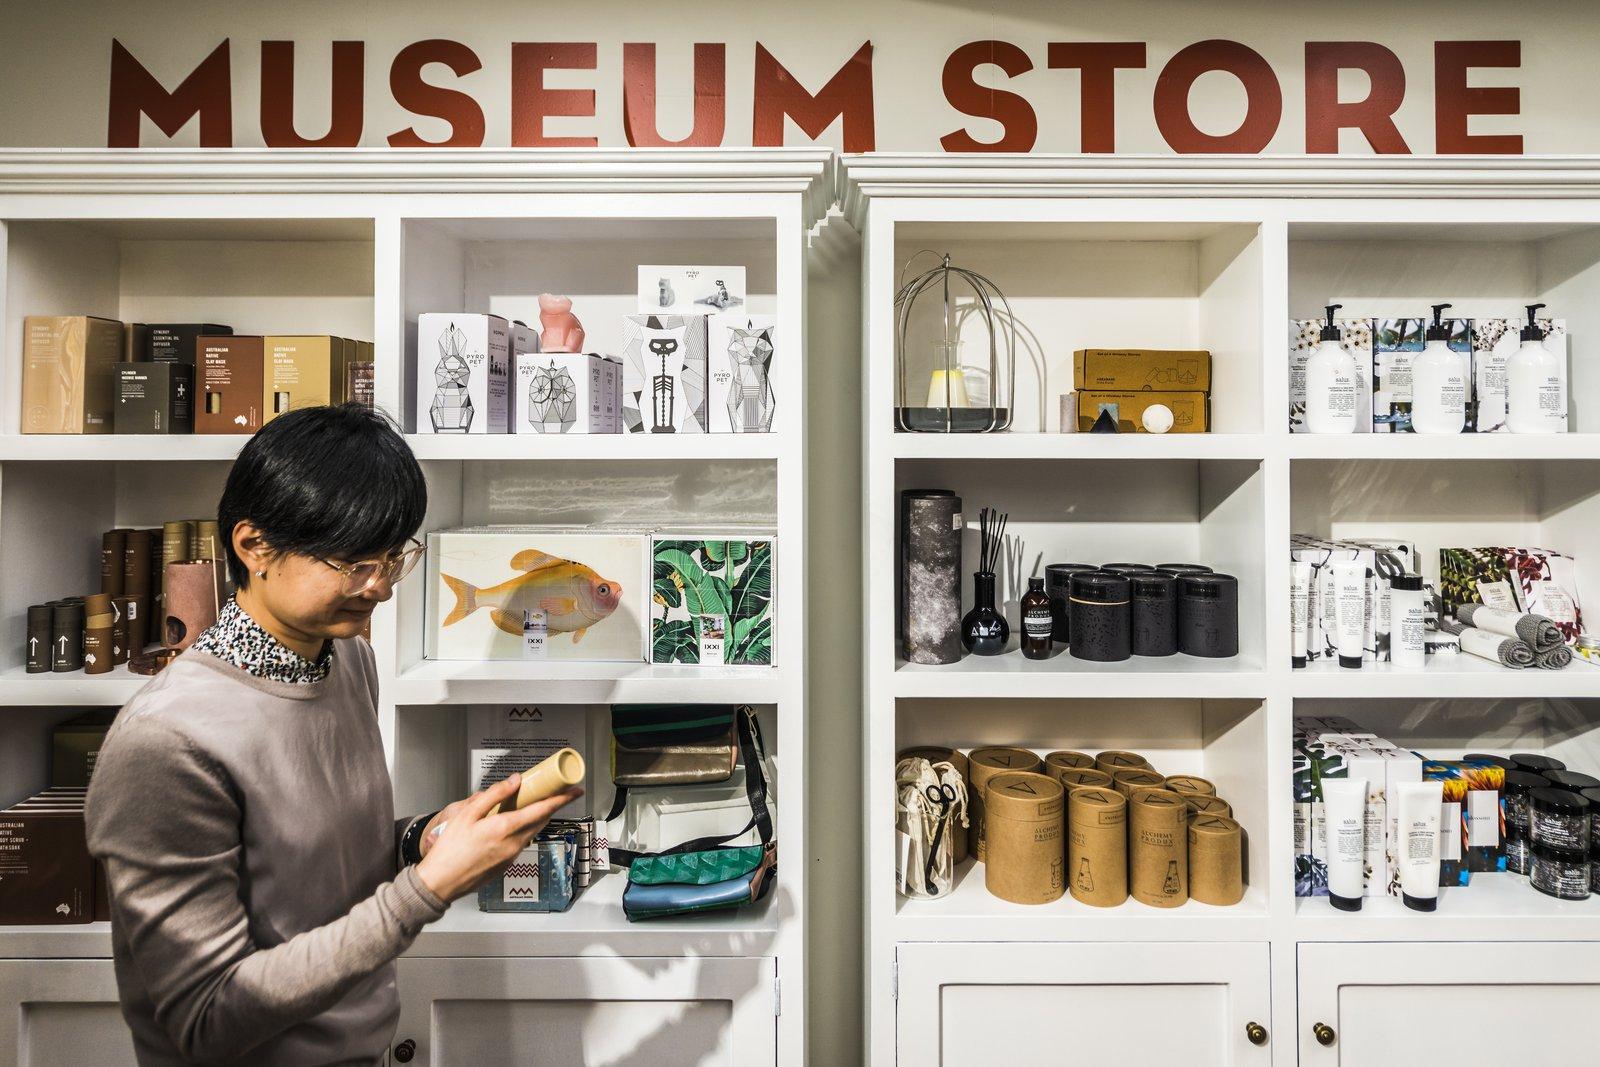 a4933fdb363f Museum Store - The Australian Museum